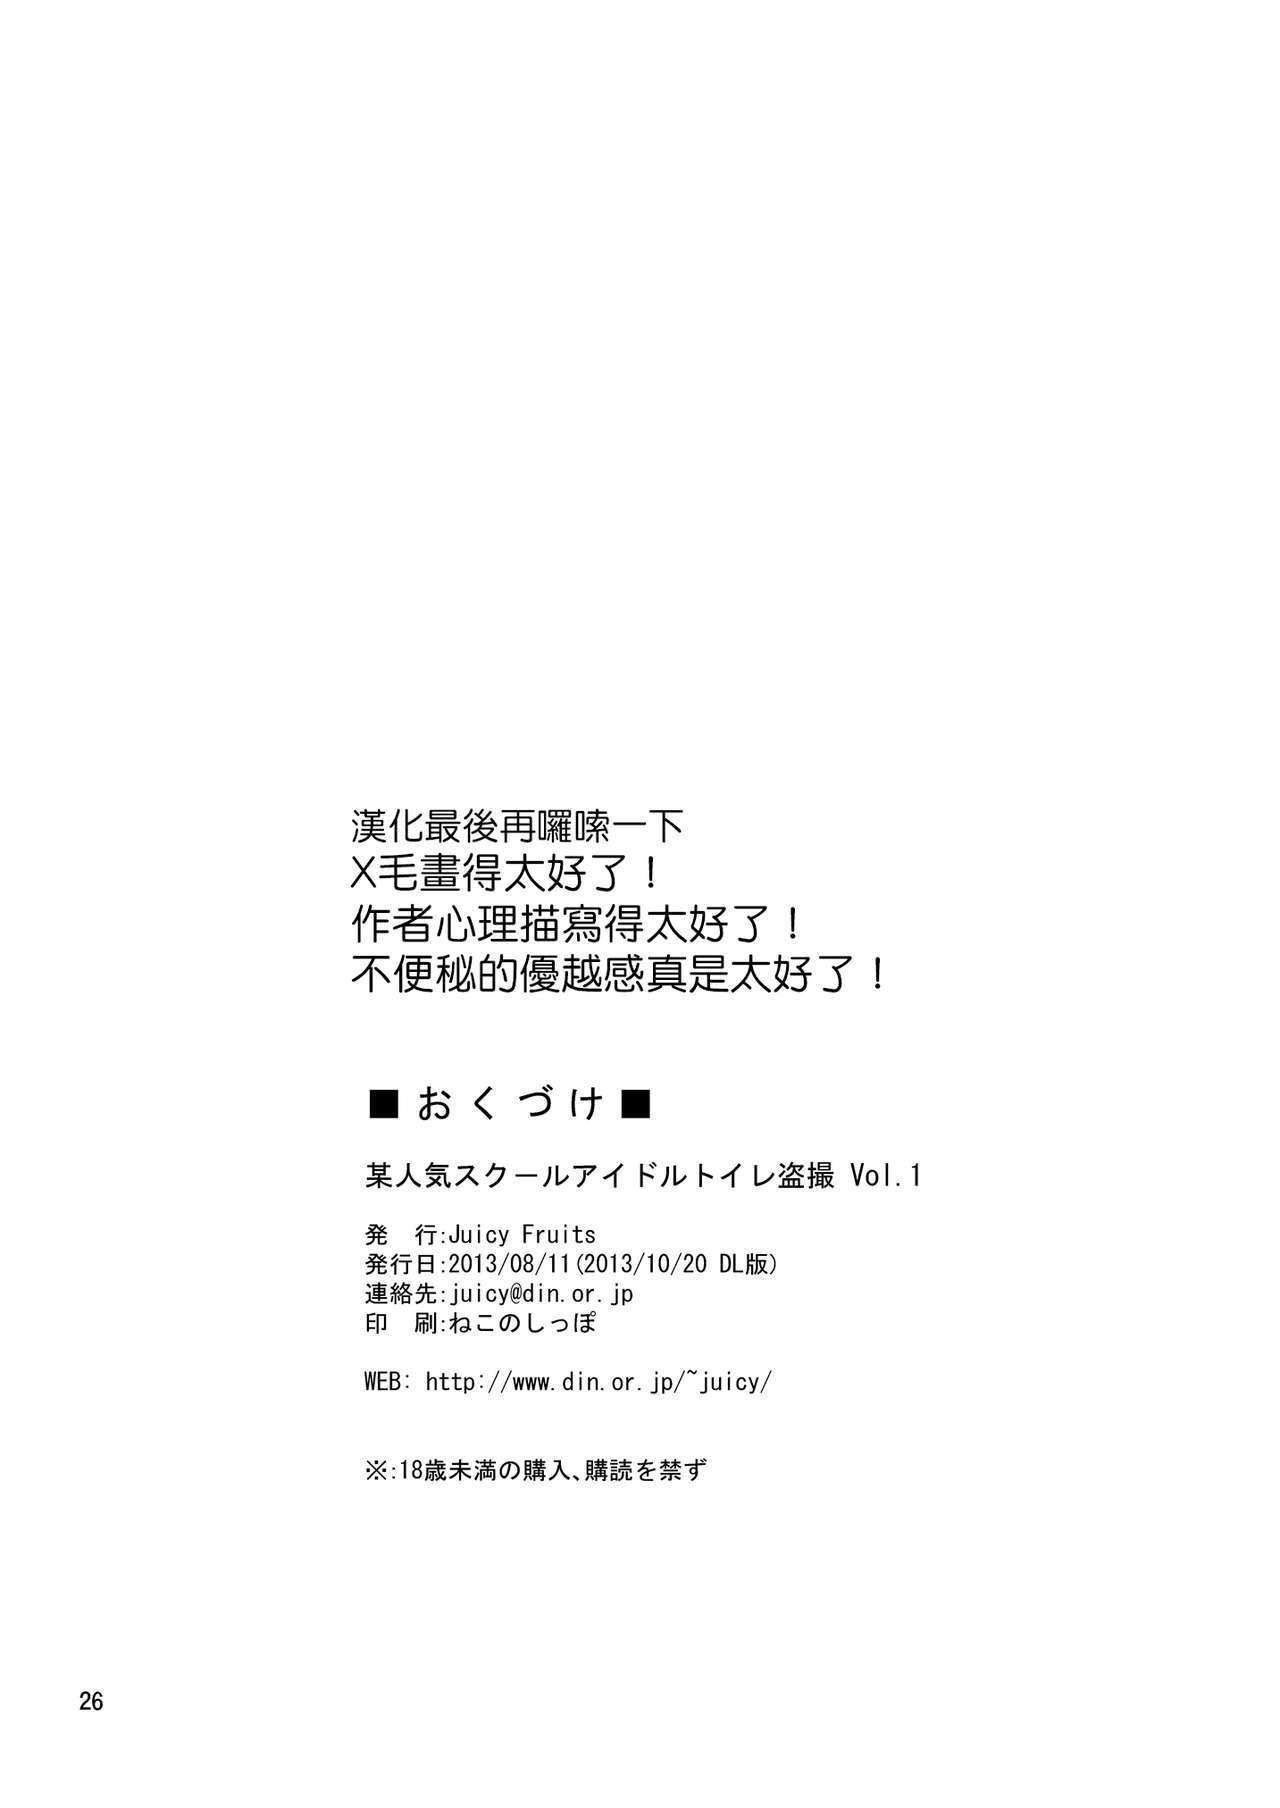 Bou Ninki School Idol Toilet Tousatsu vol. 1   某人氣學園偶像 廁所盜攝 Vol. 1 23